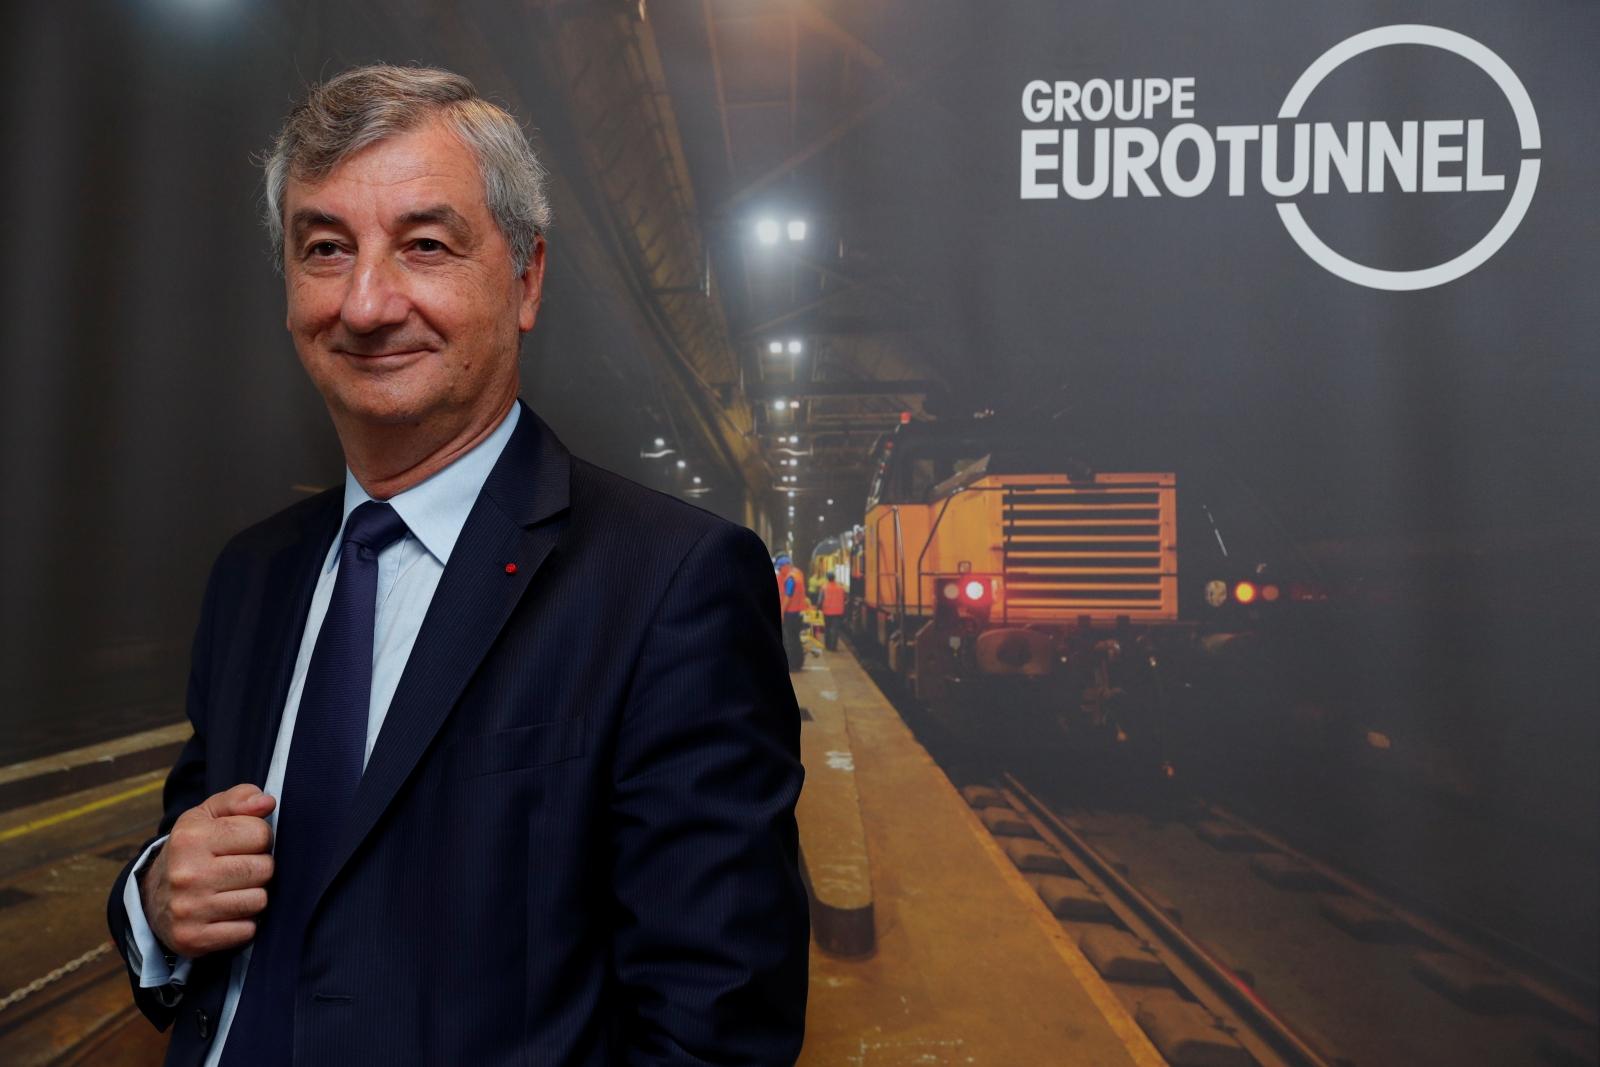 Groupe Eurotunnel posts an increase in Q3 revenues despite decline in Eurostar traffic